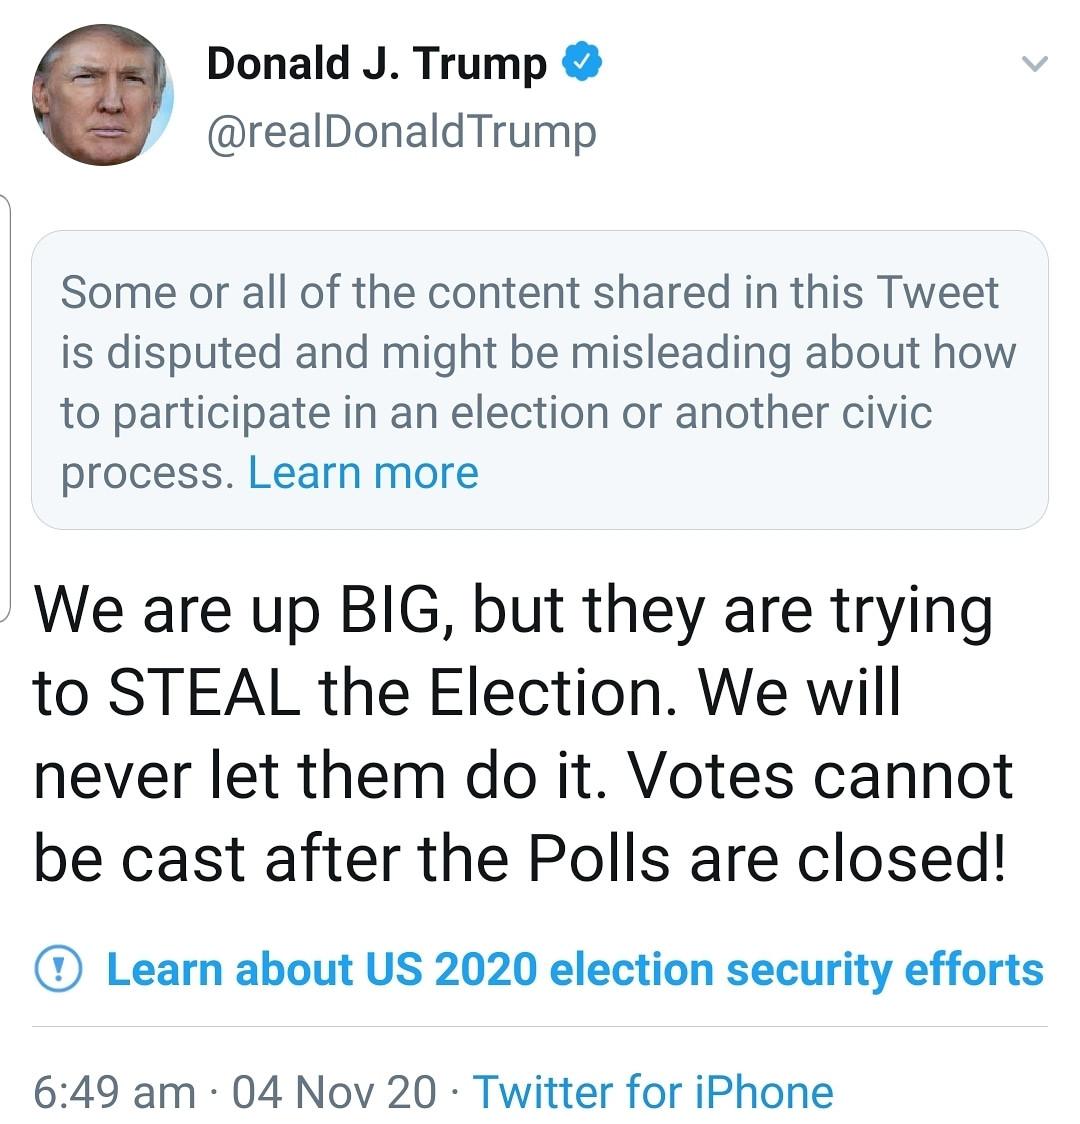 Élection américaine: Twitter restreint Donald Trump